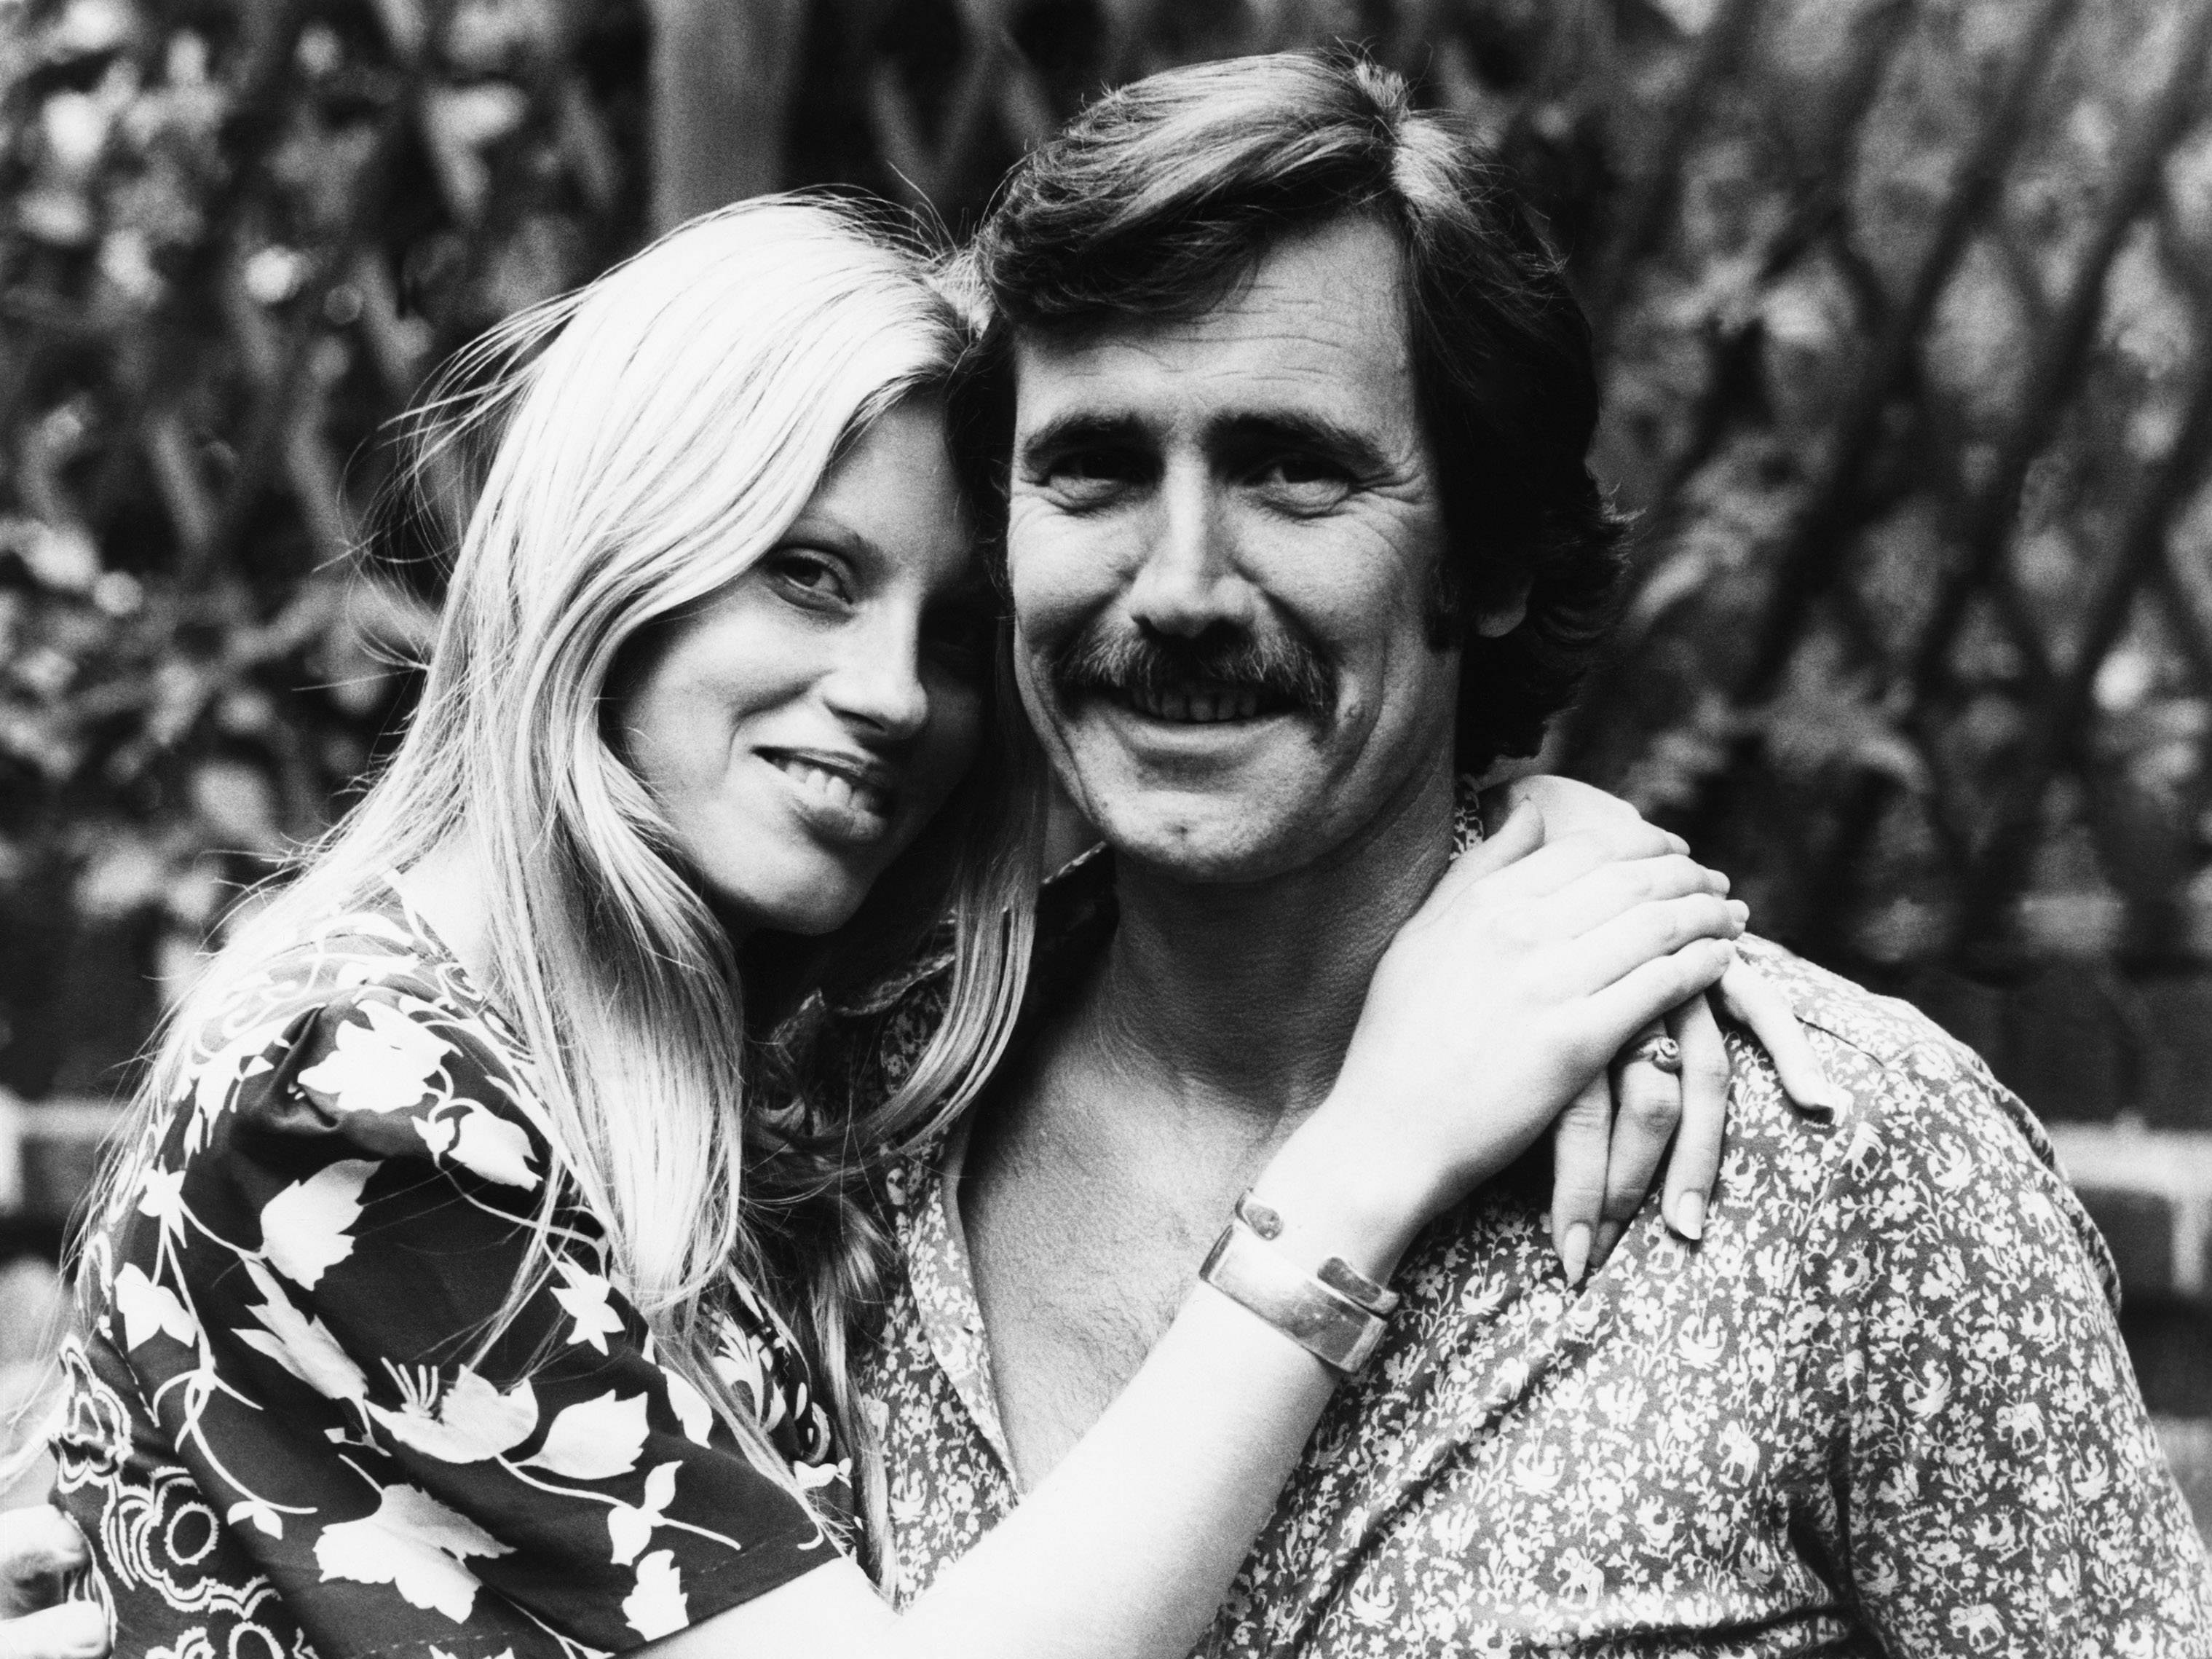 Former Bond actor Sir Roger Moore dead at 89